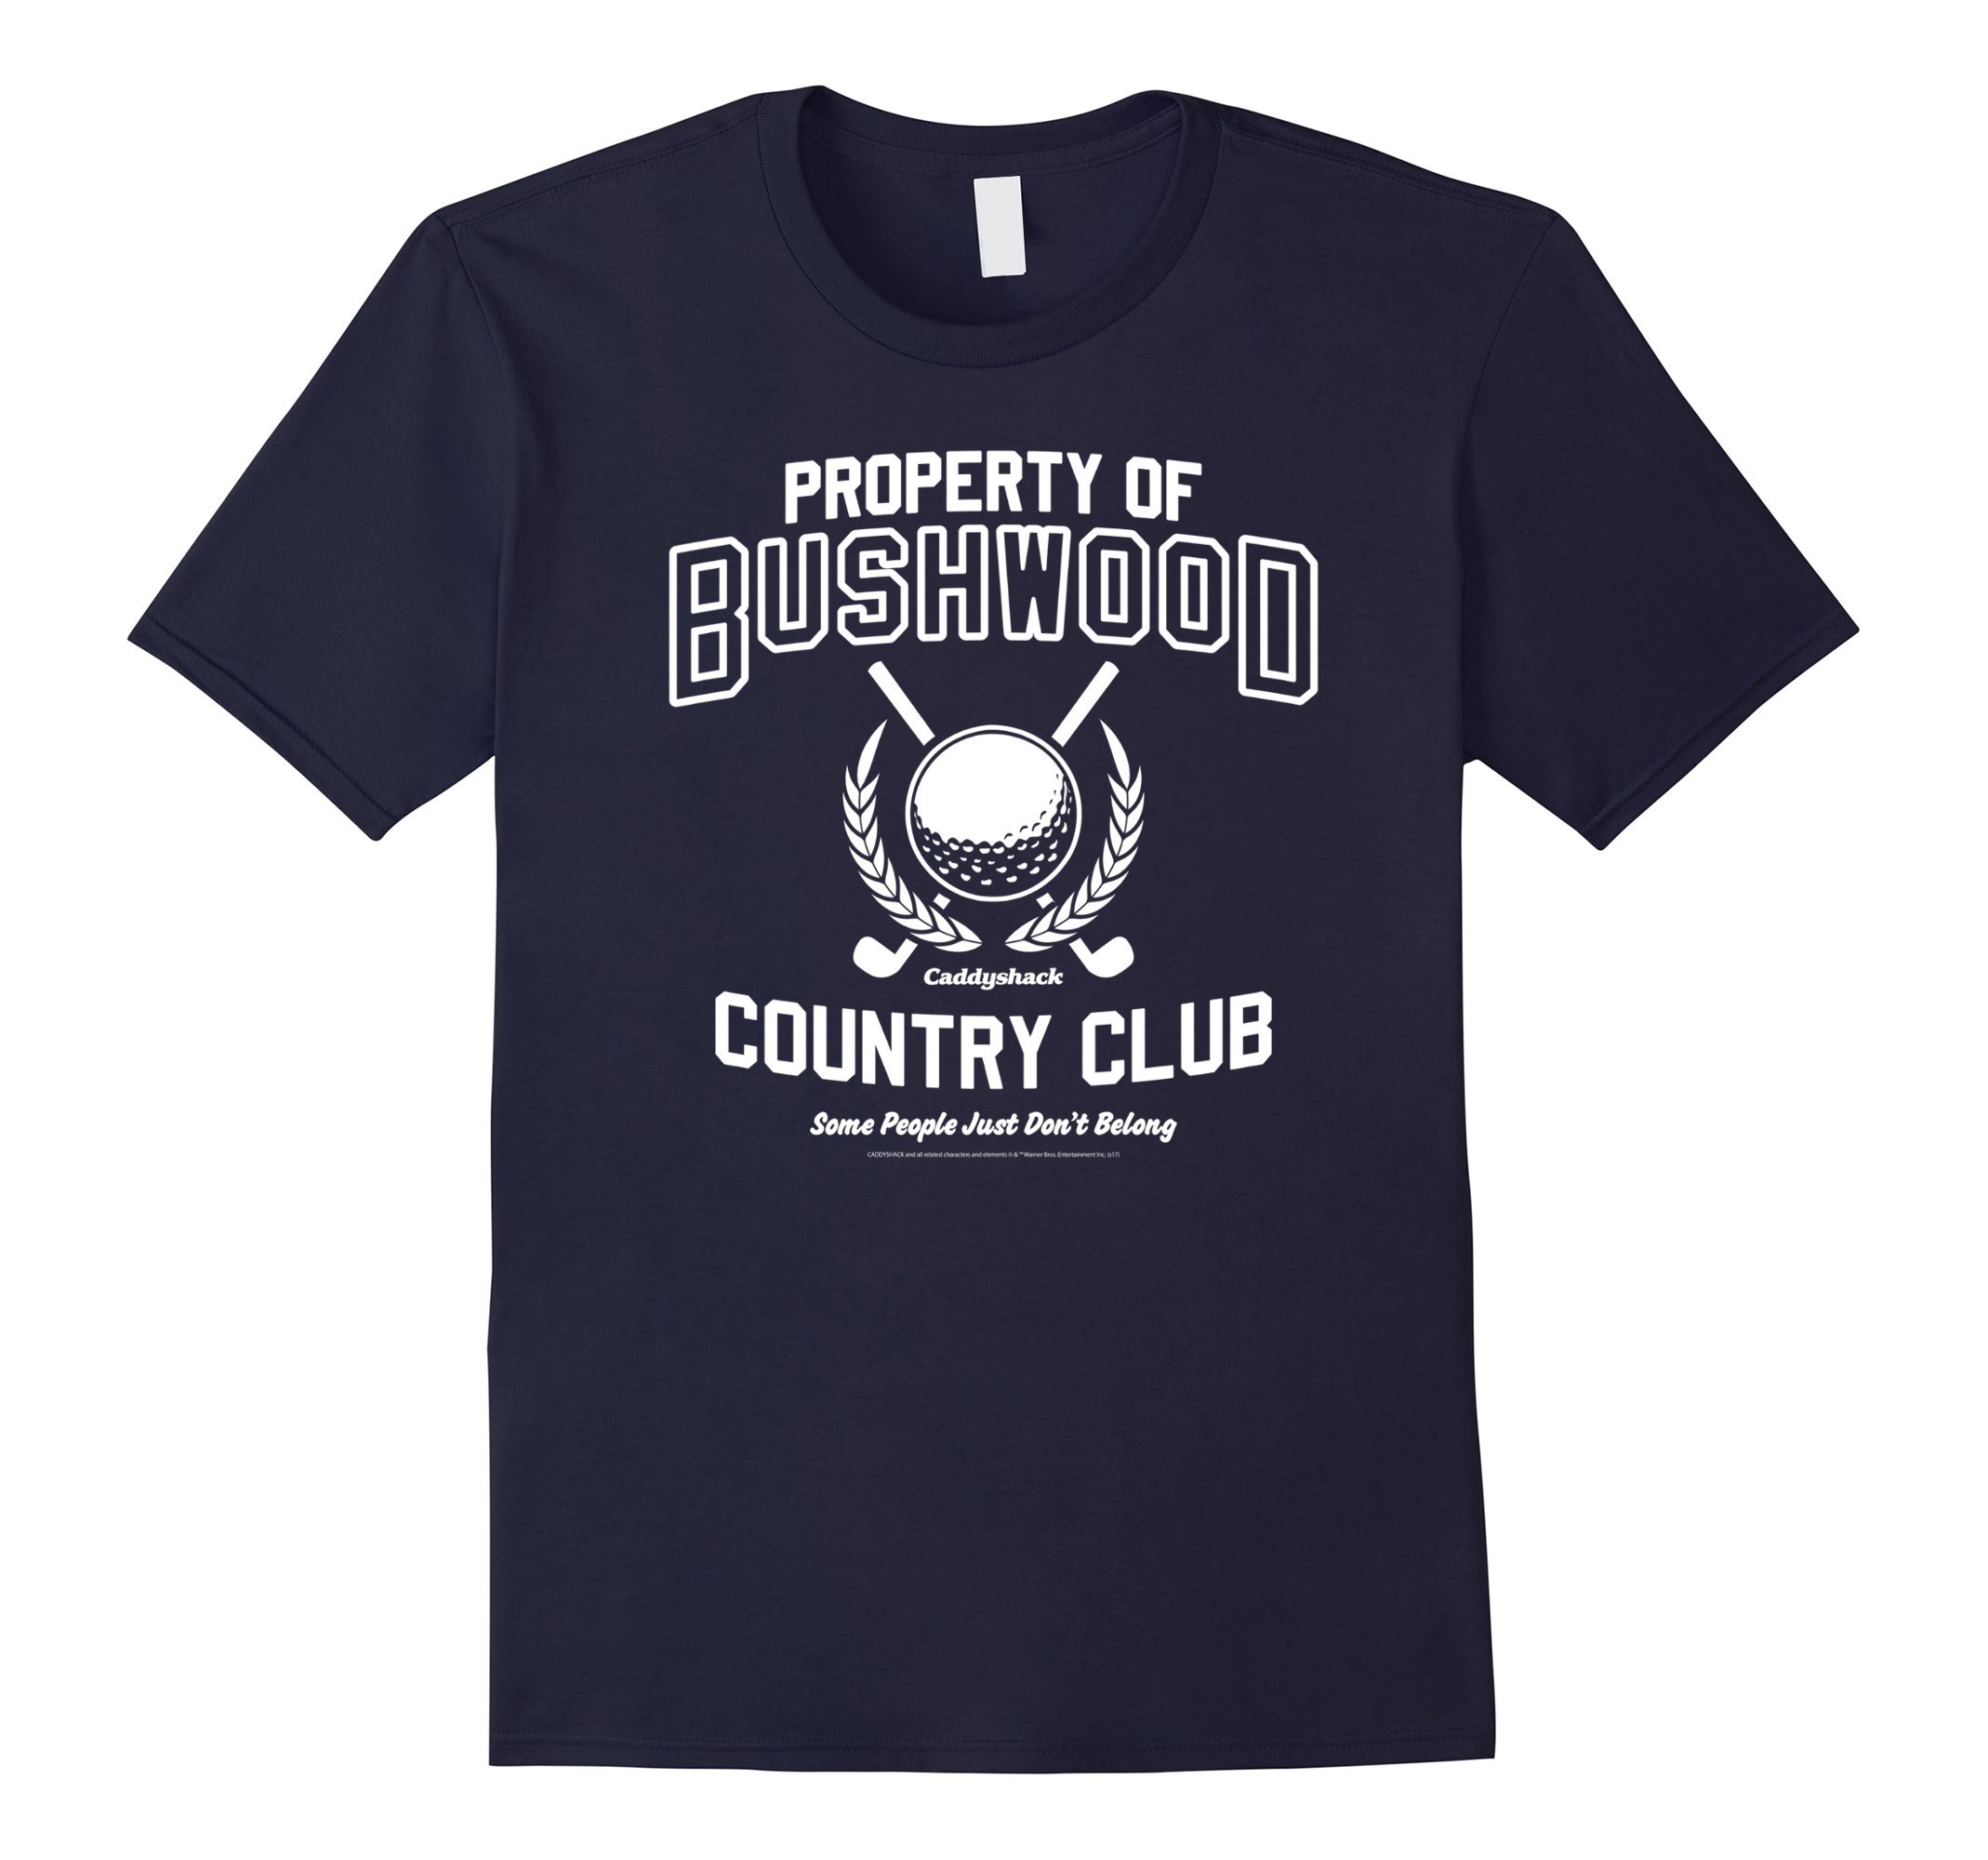 Caddyshack Property Of Bushwood Country Club Shirts